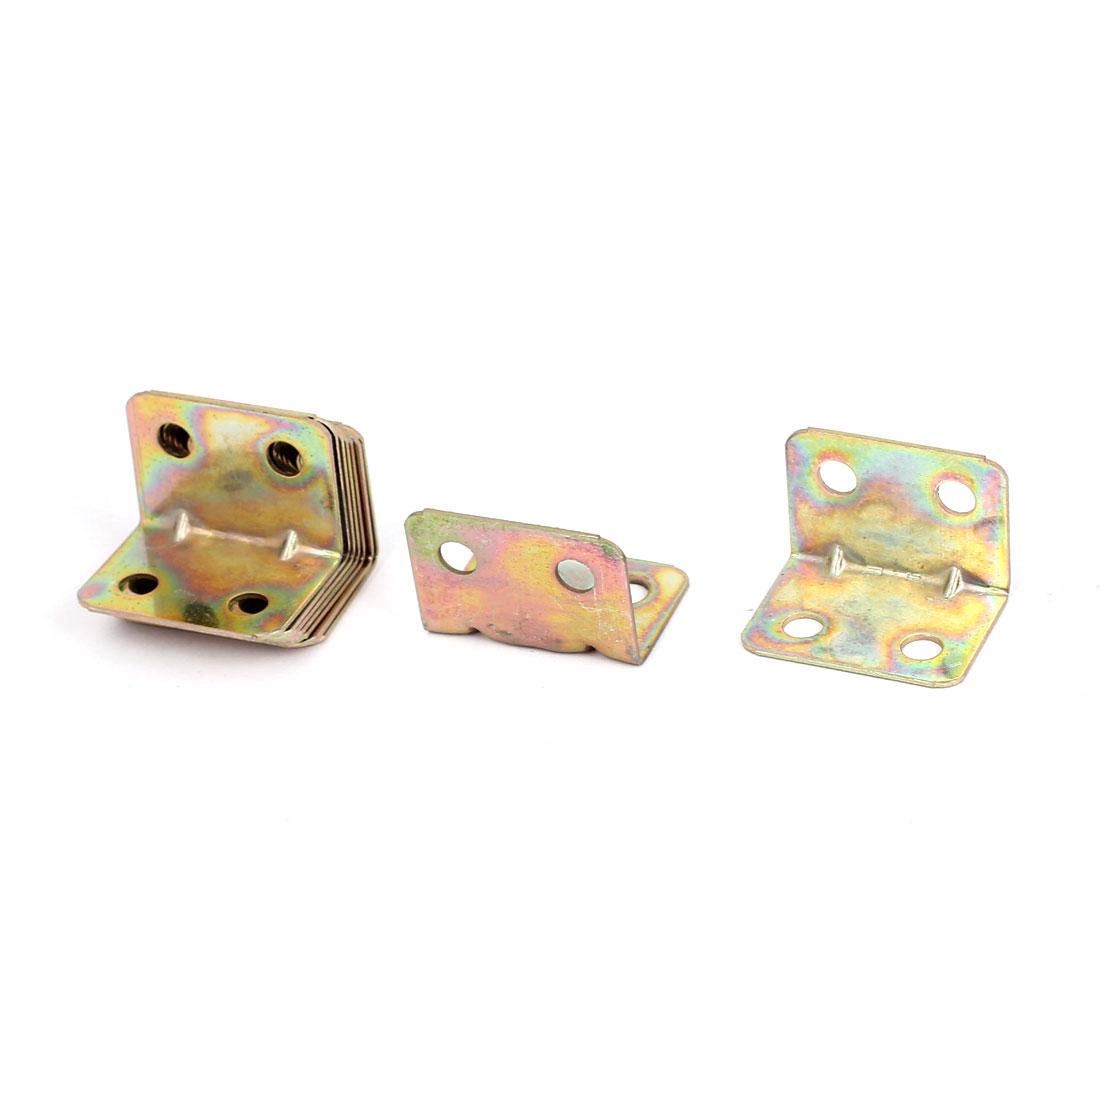 20mmx20mm L Shape Shelf Corner Brace Plate Right Angle Bracket Bronze Tone 10pcs